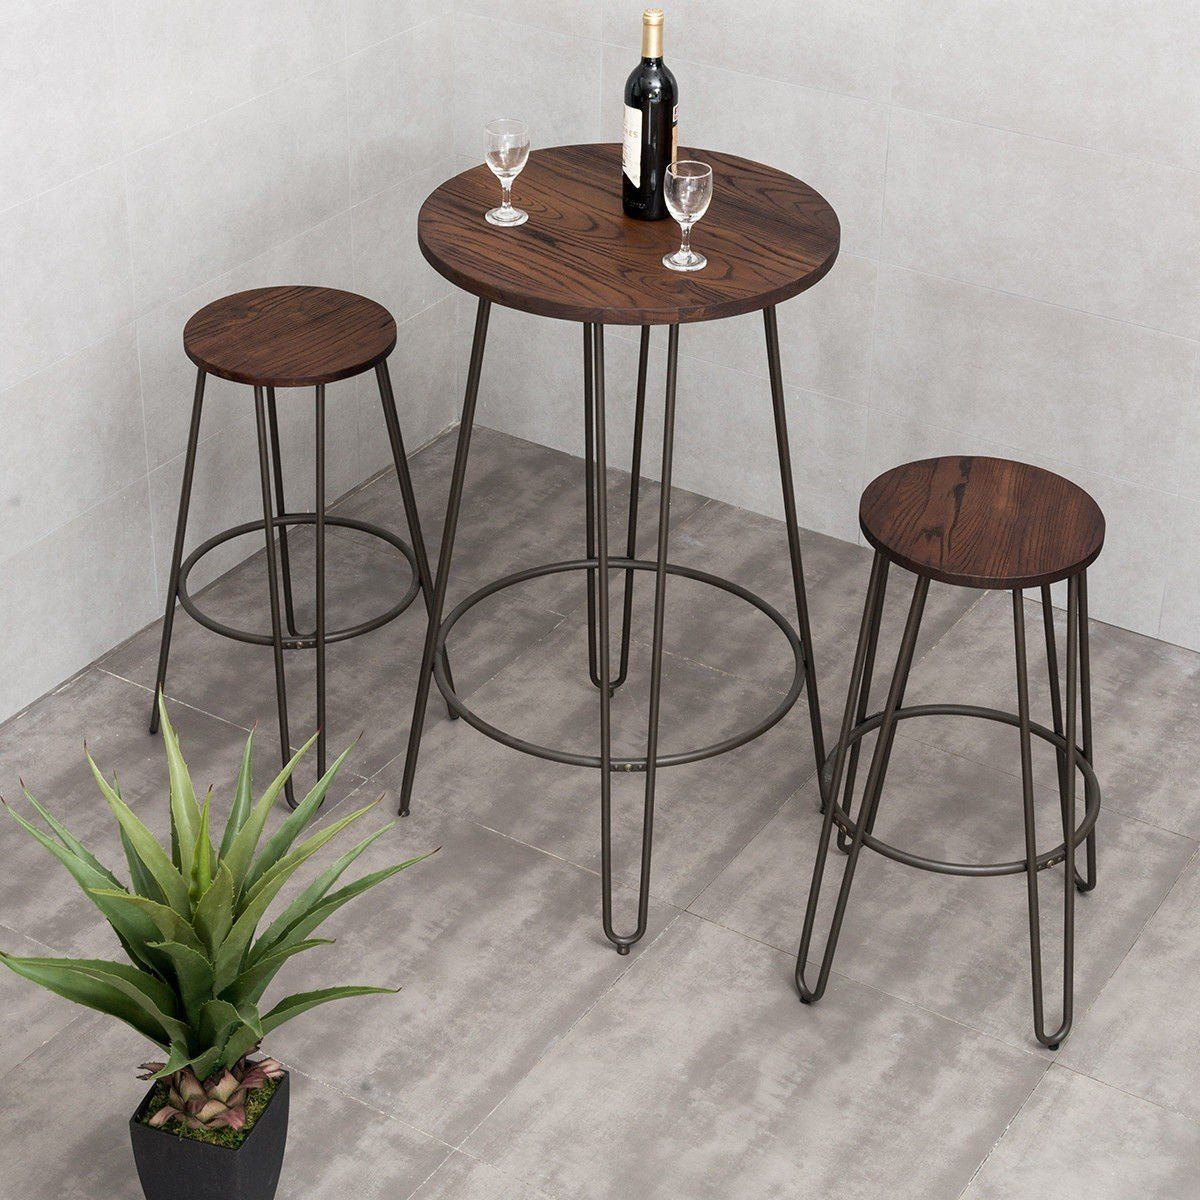 3 Pcs Wood Round Bar Table Bistro Stool Set Bar Table And Stools Round Bar Table Bar Table Sets